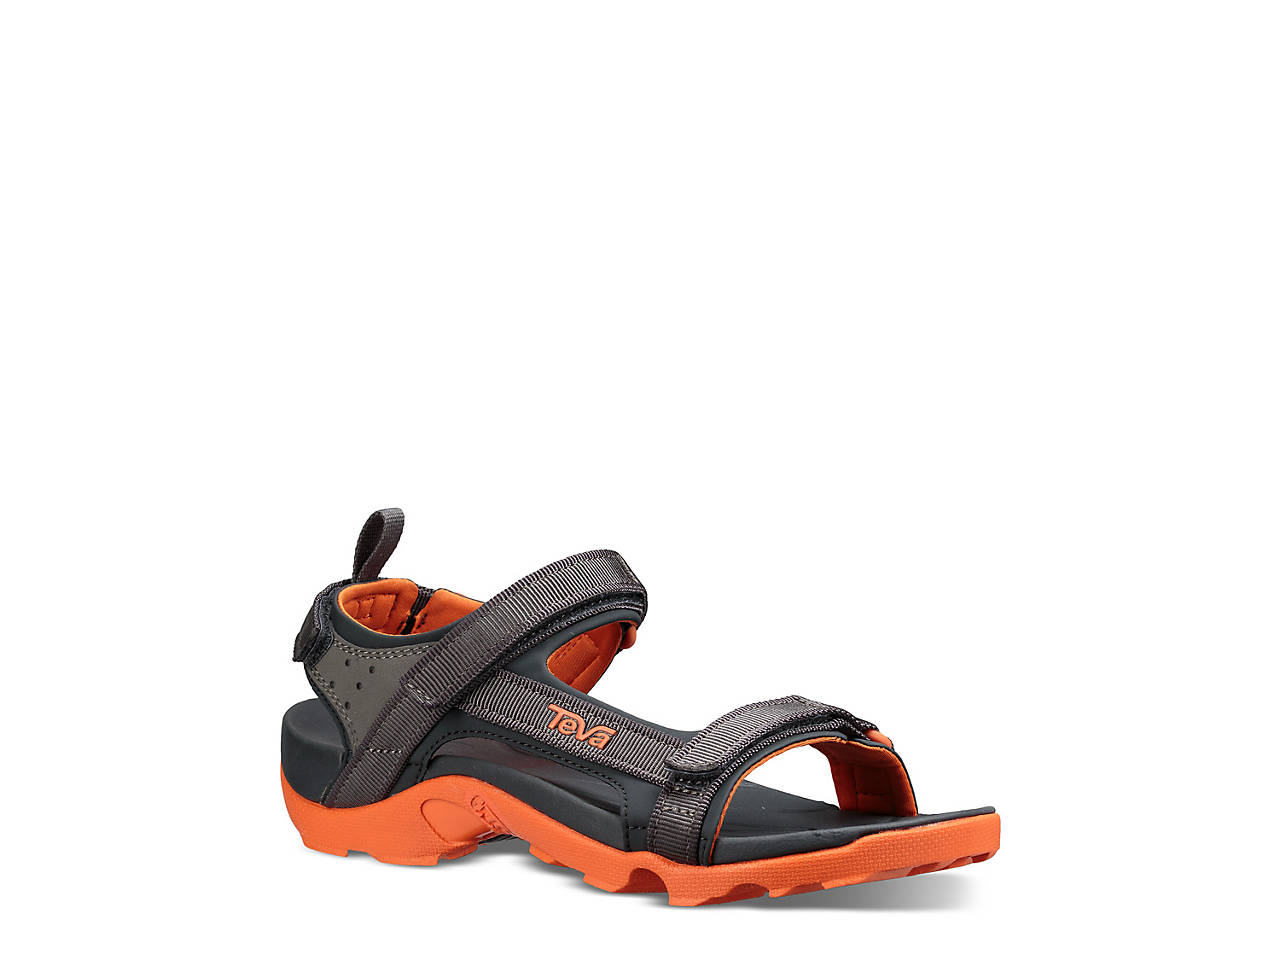 f23b05549ee6 Teva Tanza Toddler   Youth Sandal Kids Shoes